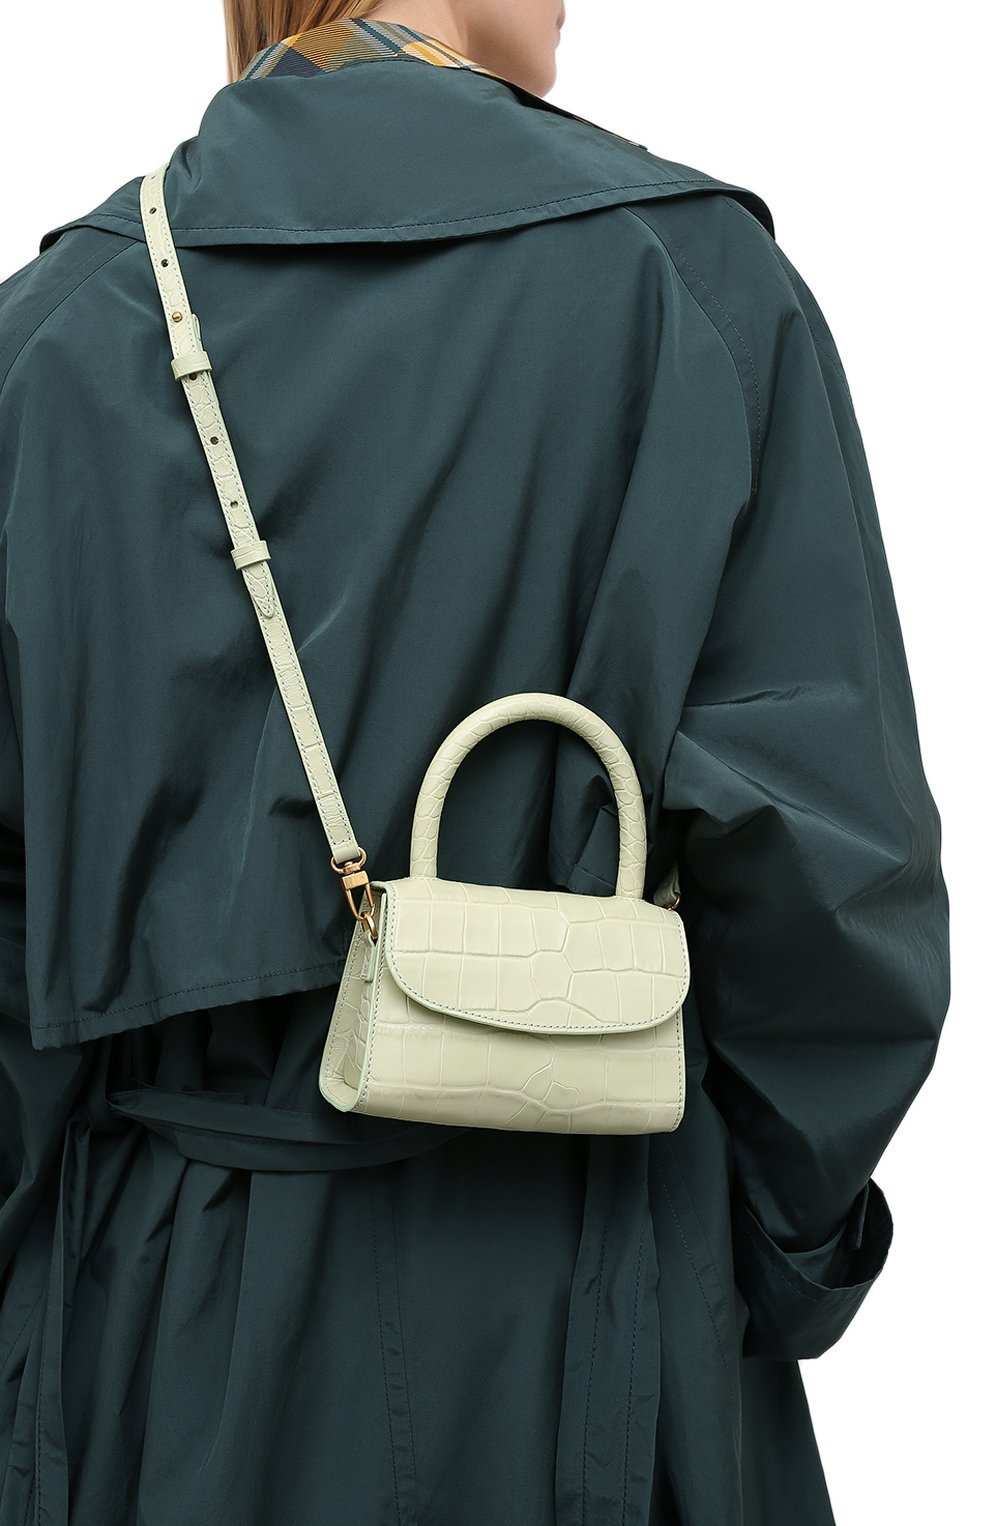 Женская сумка mini BY FAR светло-зеленого цвета, арт. 18FWMINASGDSMA | Фото 5 (Сумки-технические: Сумки через плечо, Сумки top-handle; Материал: Натуральная кожа; Размер: mini; Ремень/цепочка: На ремешке)